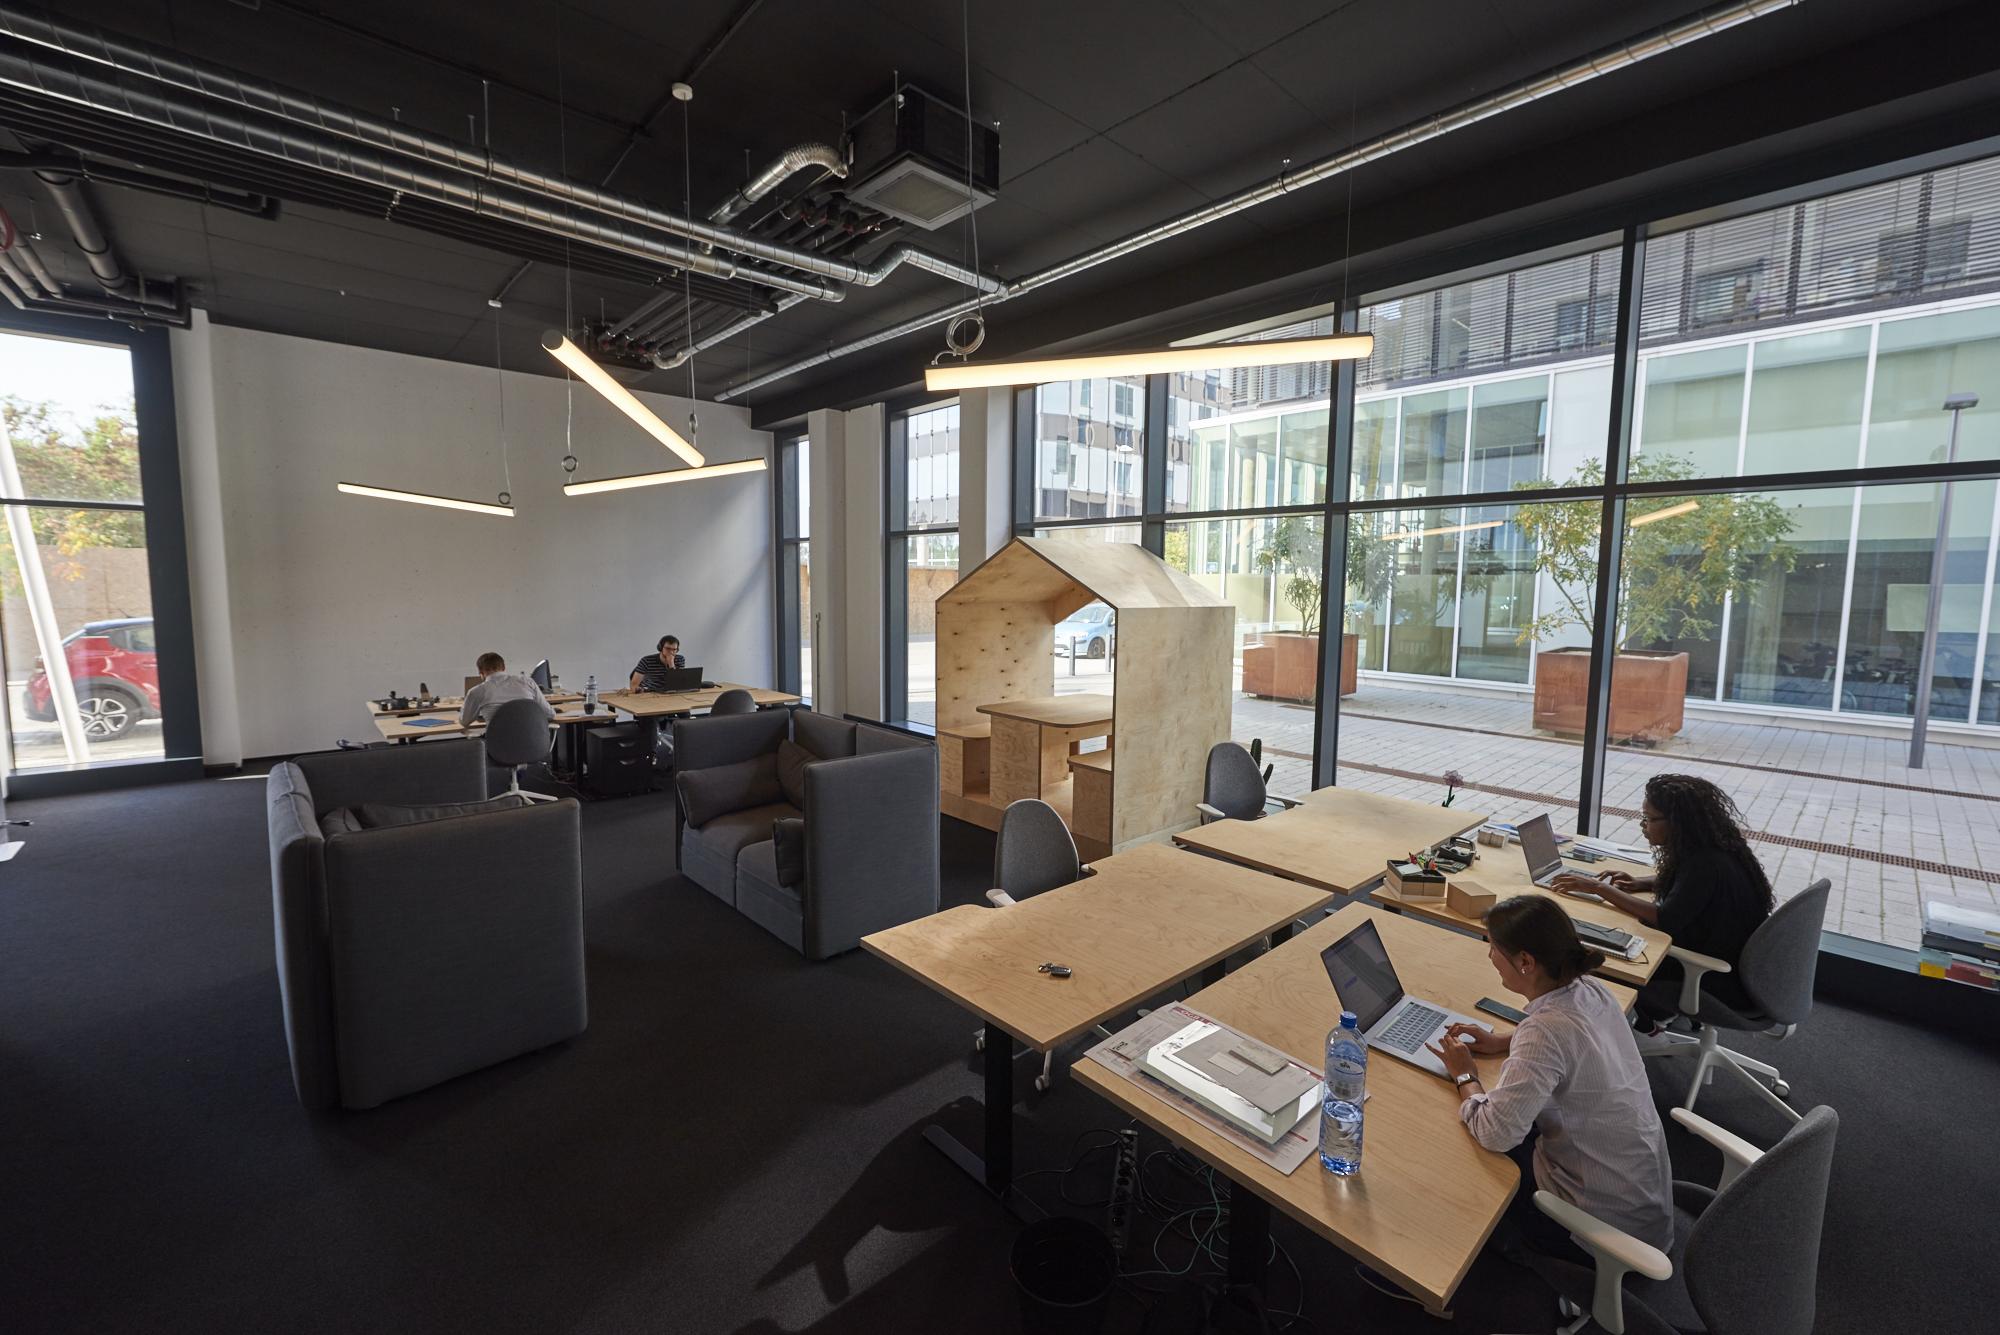 Cool work environment !